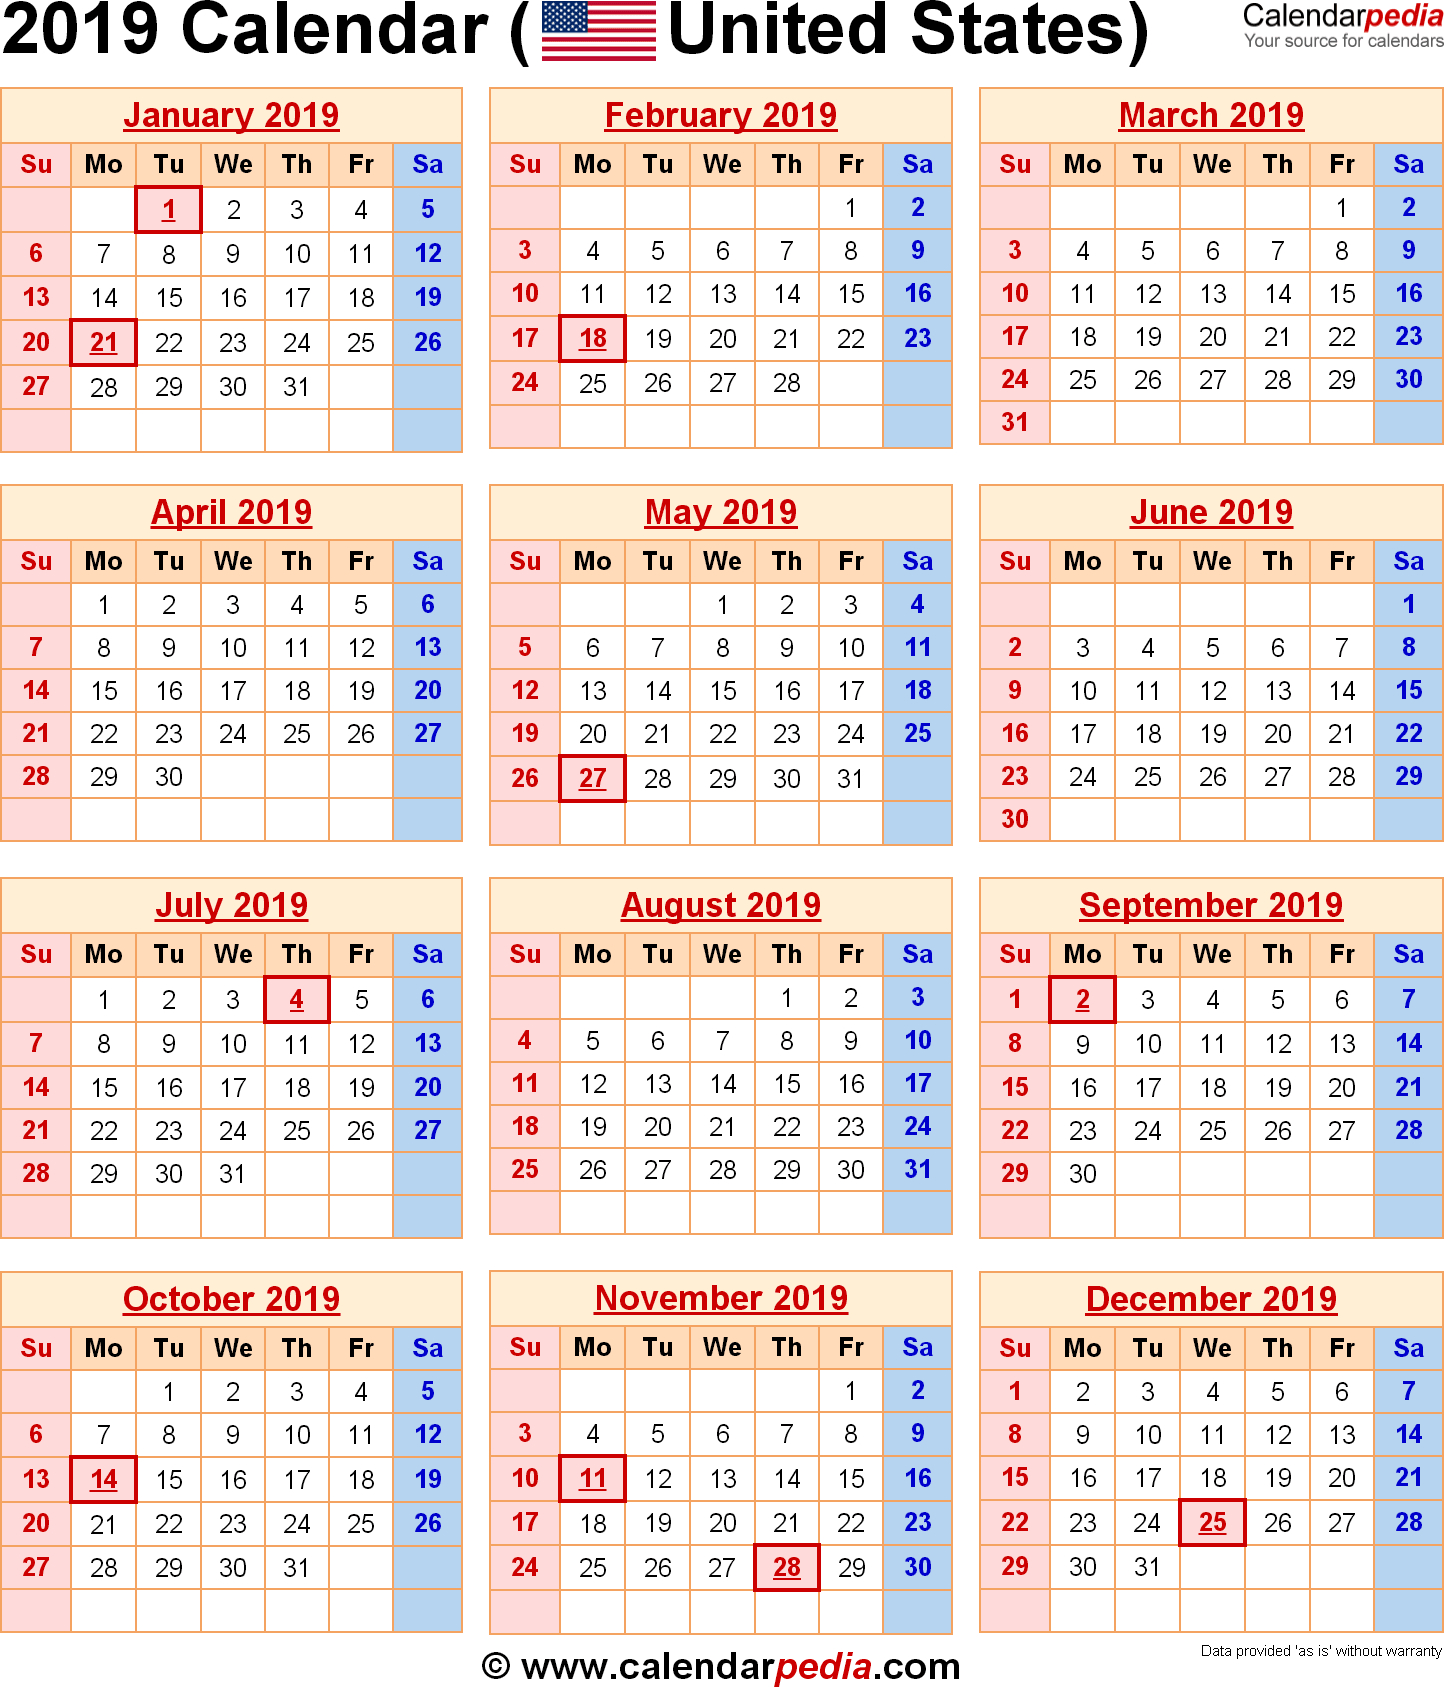 2019 Us Calendar - Icard.cmi-C Calendar 2019 Us Holidays